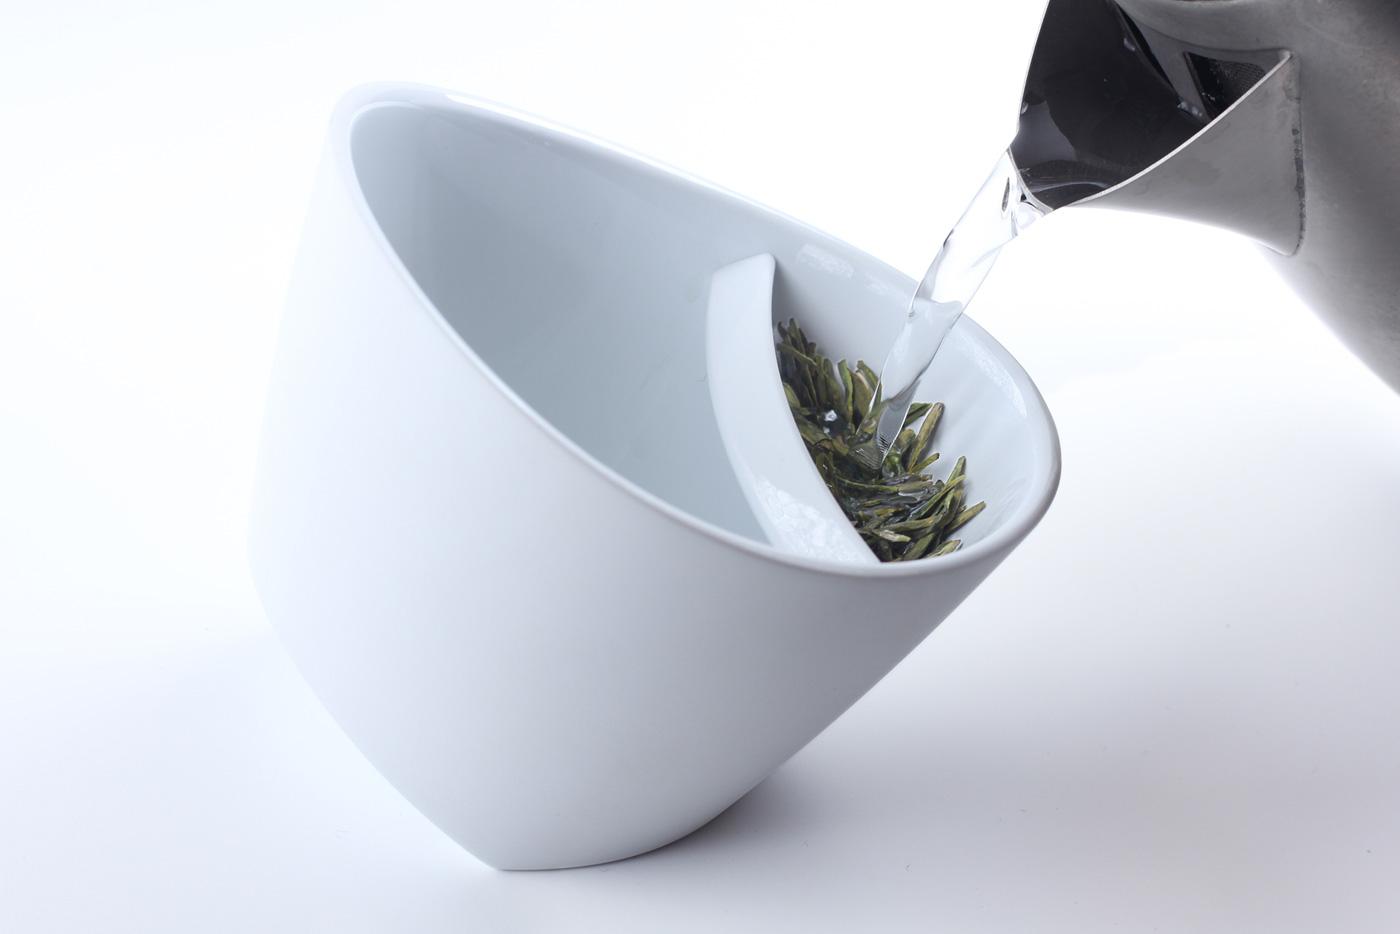 awesome-design-ideas-Teacup-Laura-Bougdanos-magisso-4